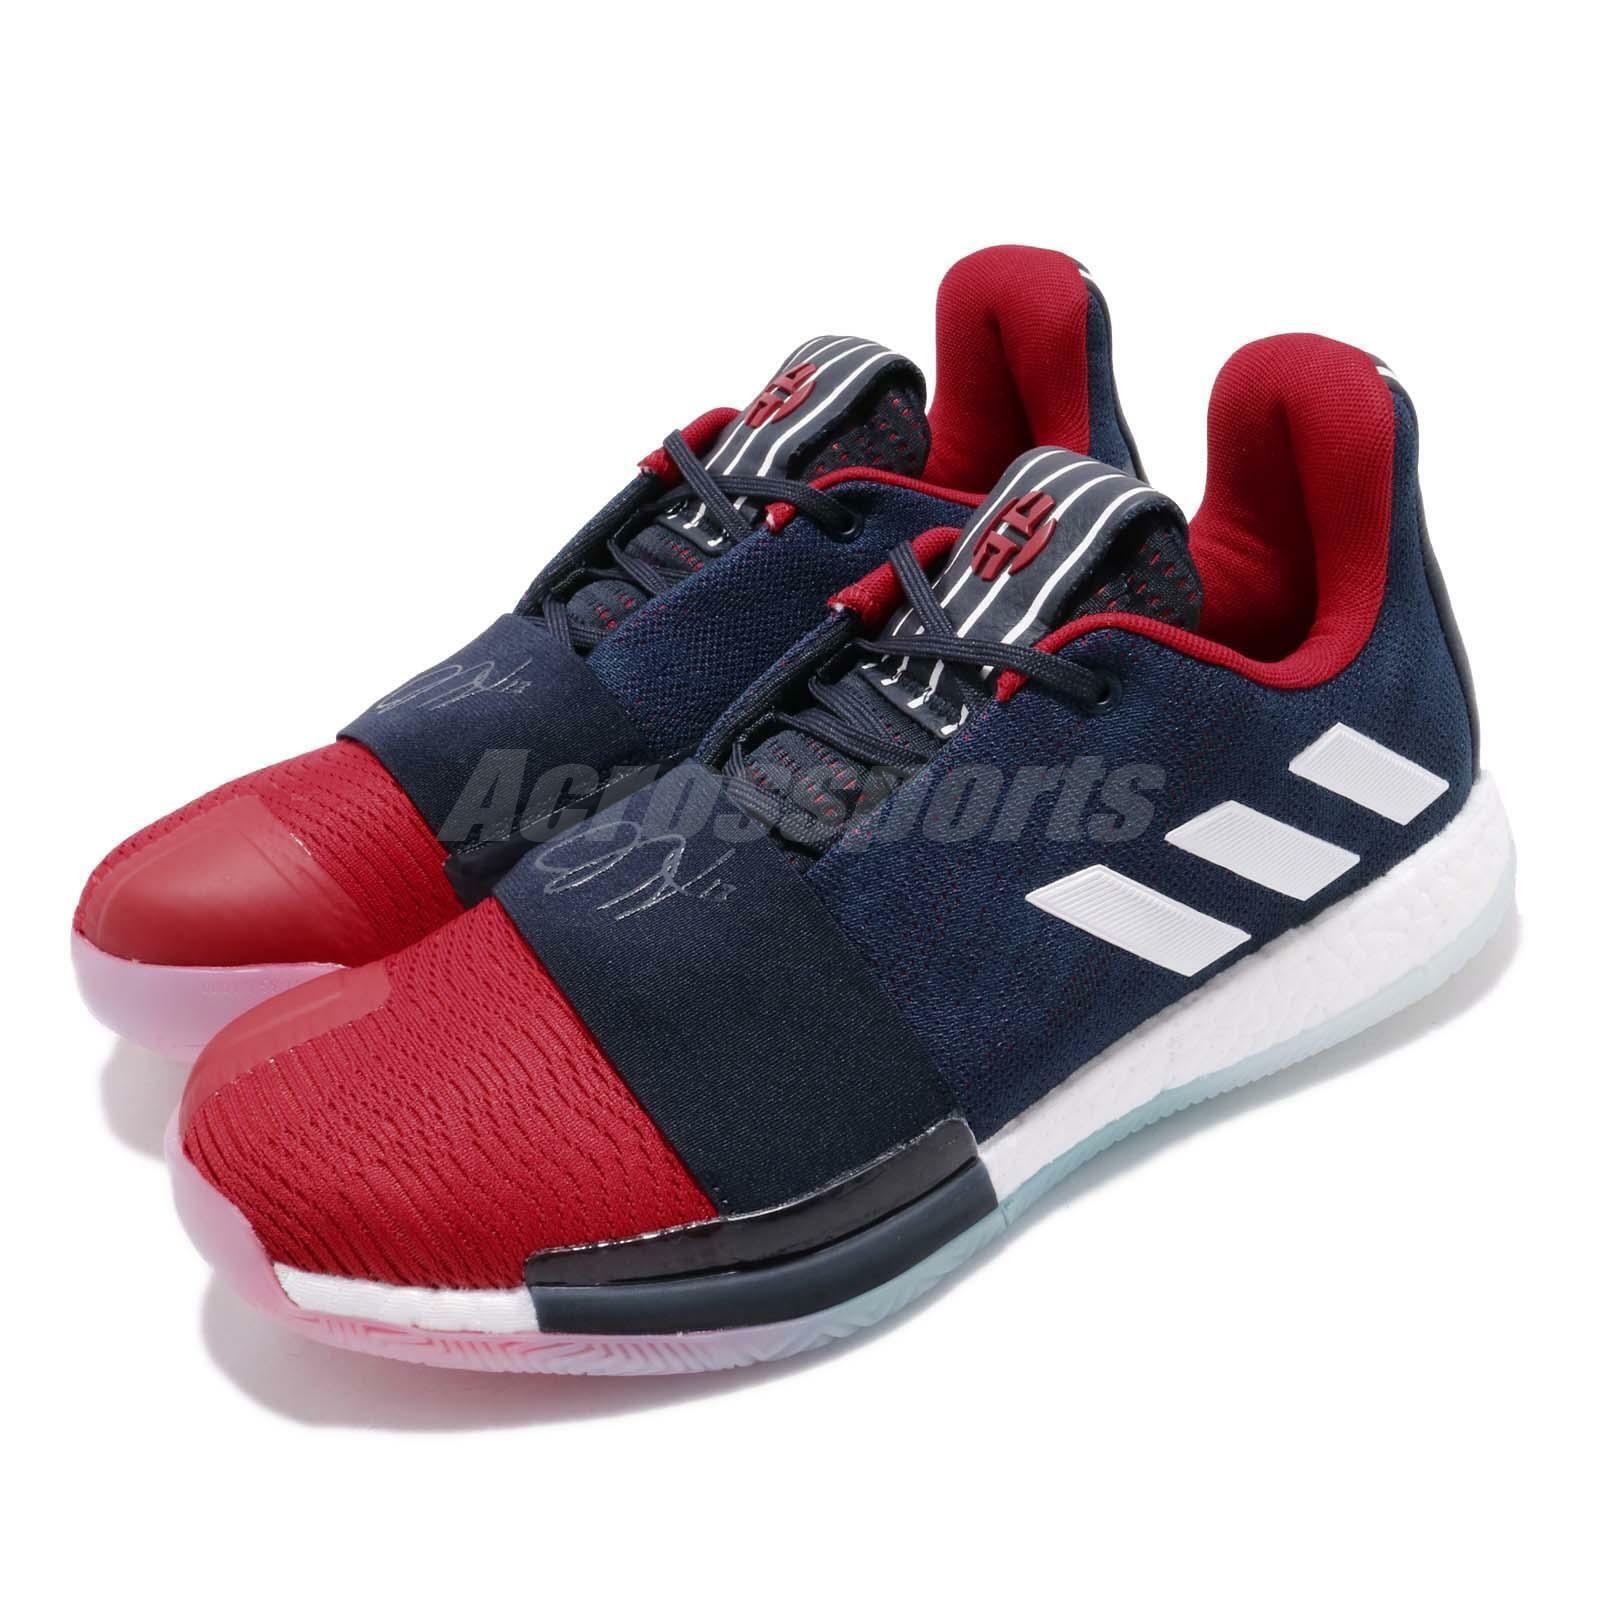 Adidas Harden Vol. 3 3 3 BOOST James Harden 13 XIII Uomo Basketball scarpe Pick 1 a75b27